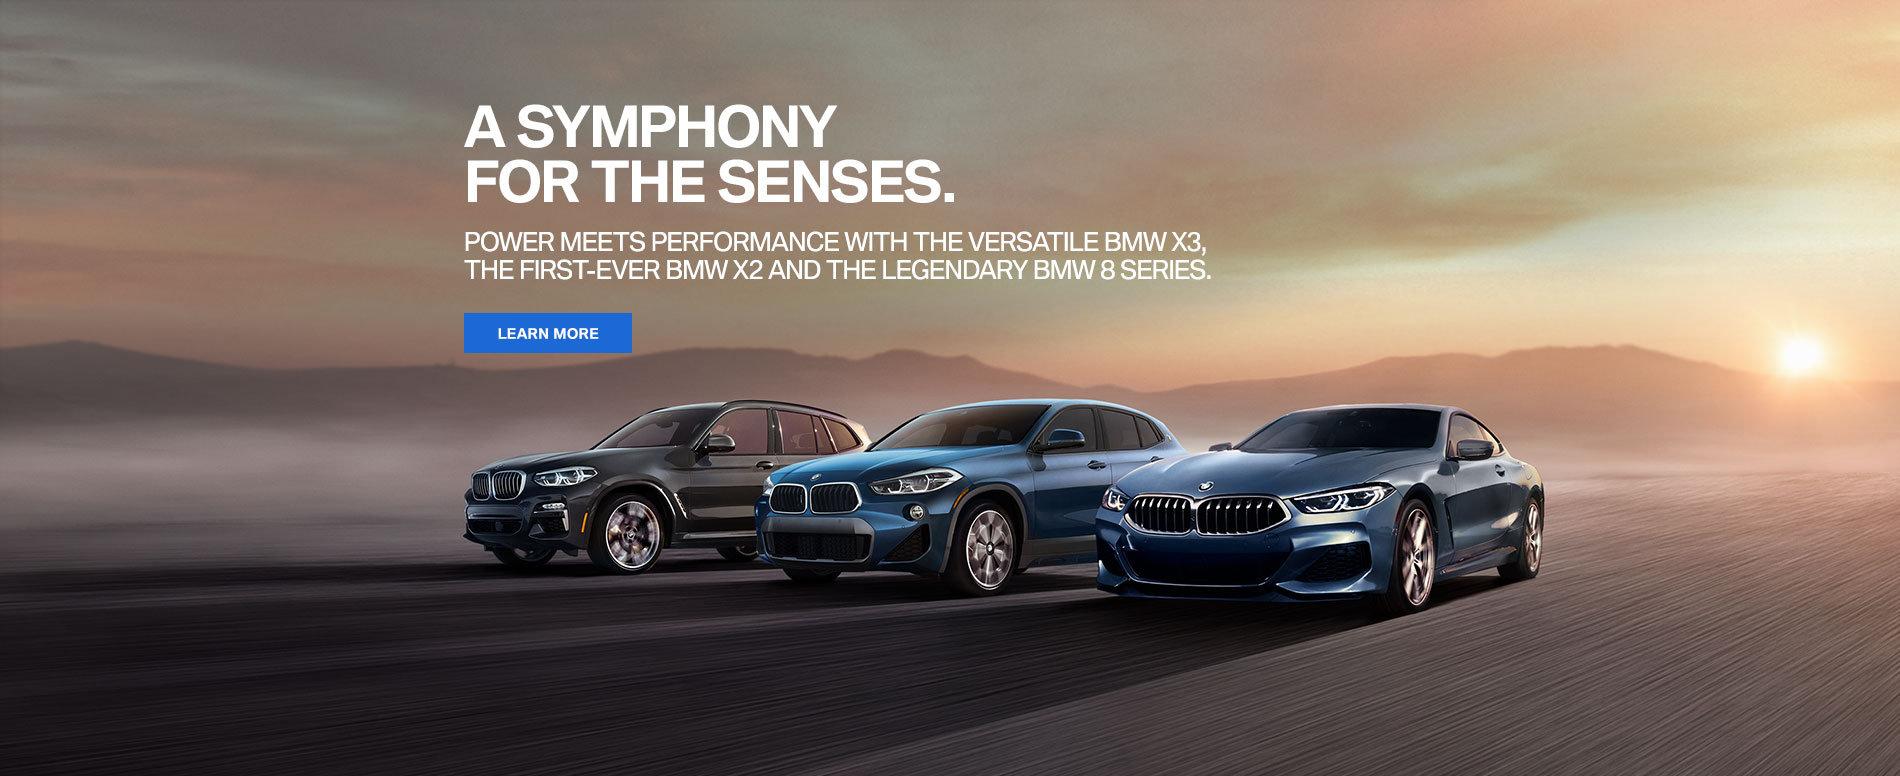 Hyundai Round Rock >> BMW Car Dealer - Austin, Round Rock, & Cedar Park, TX ...